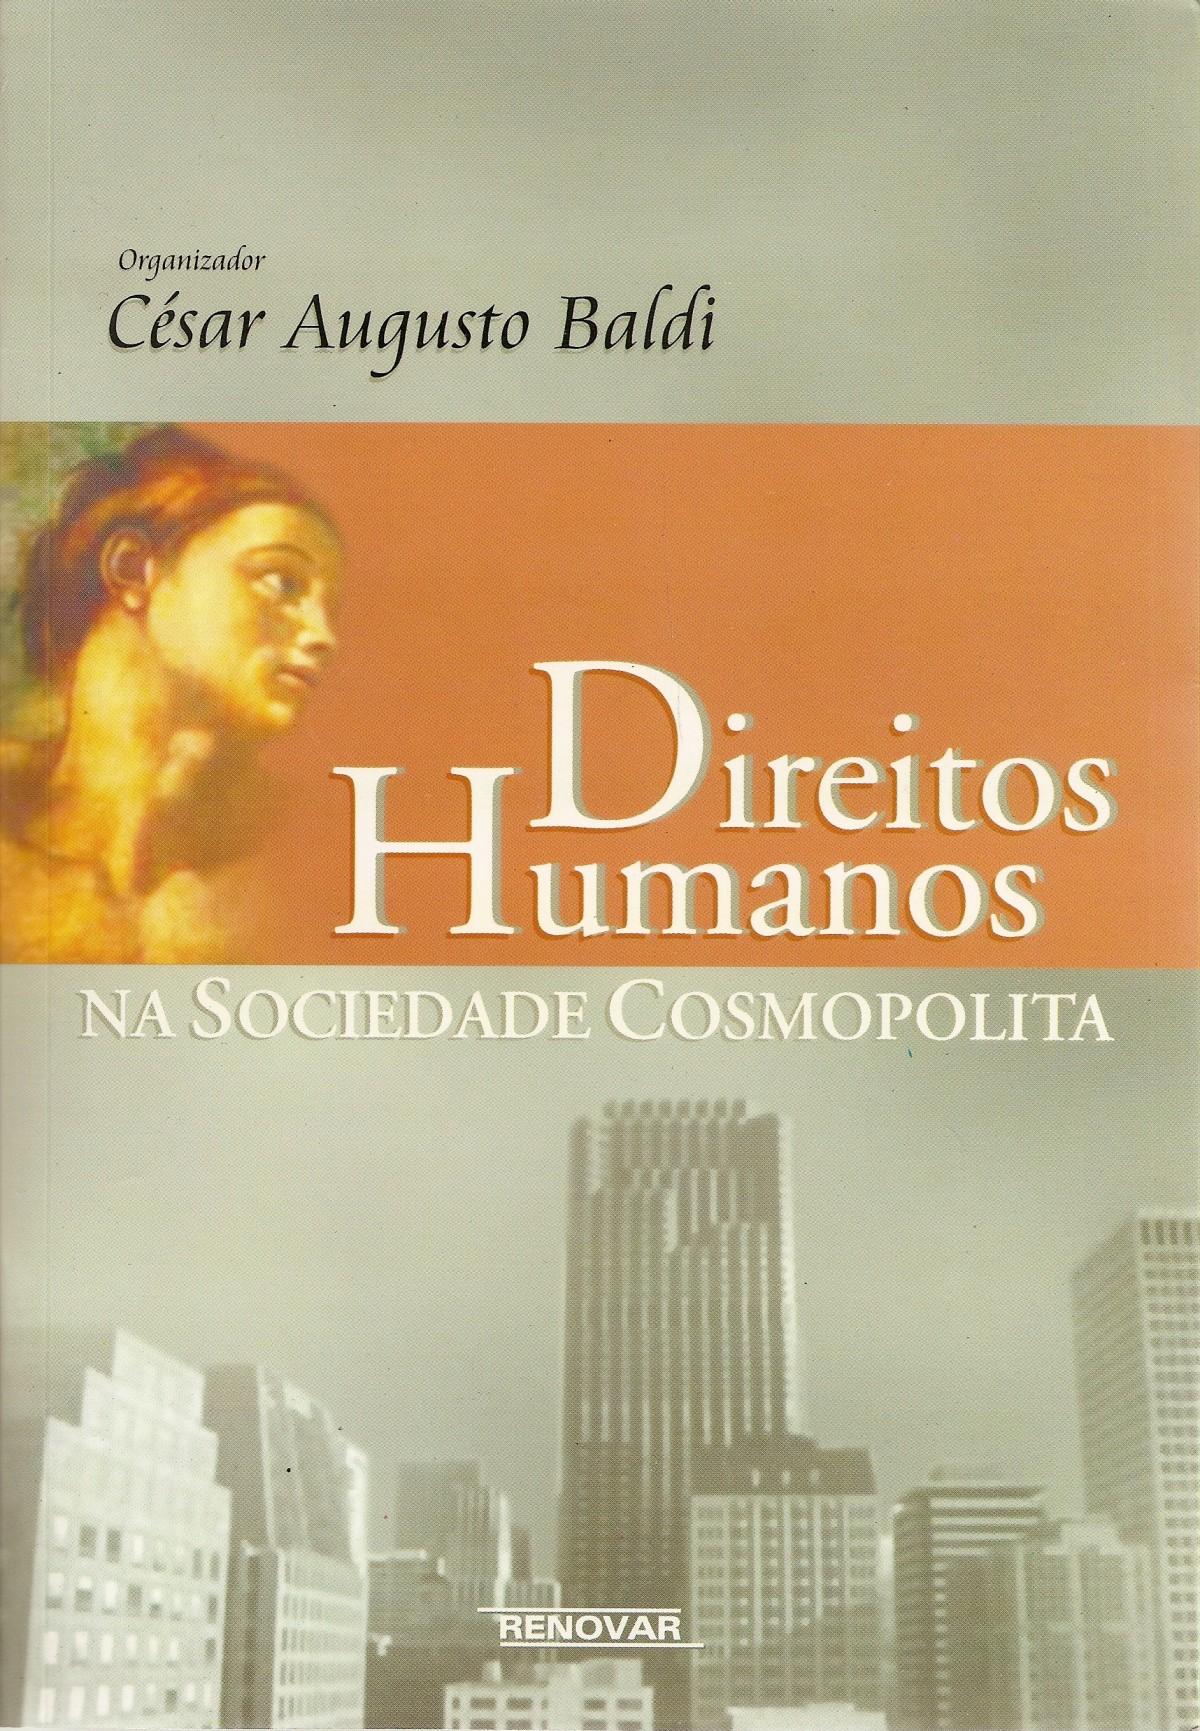 Foto 1 - Direitos Humanos na Sociedade Cosmopolita